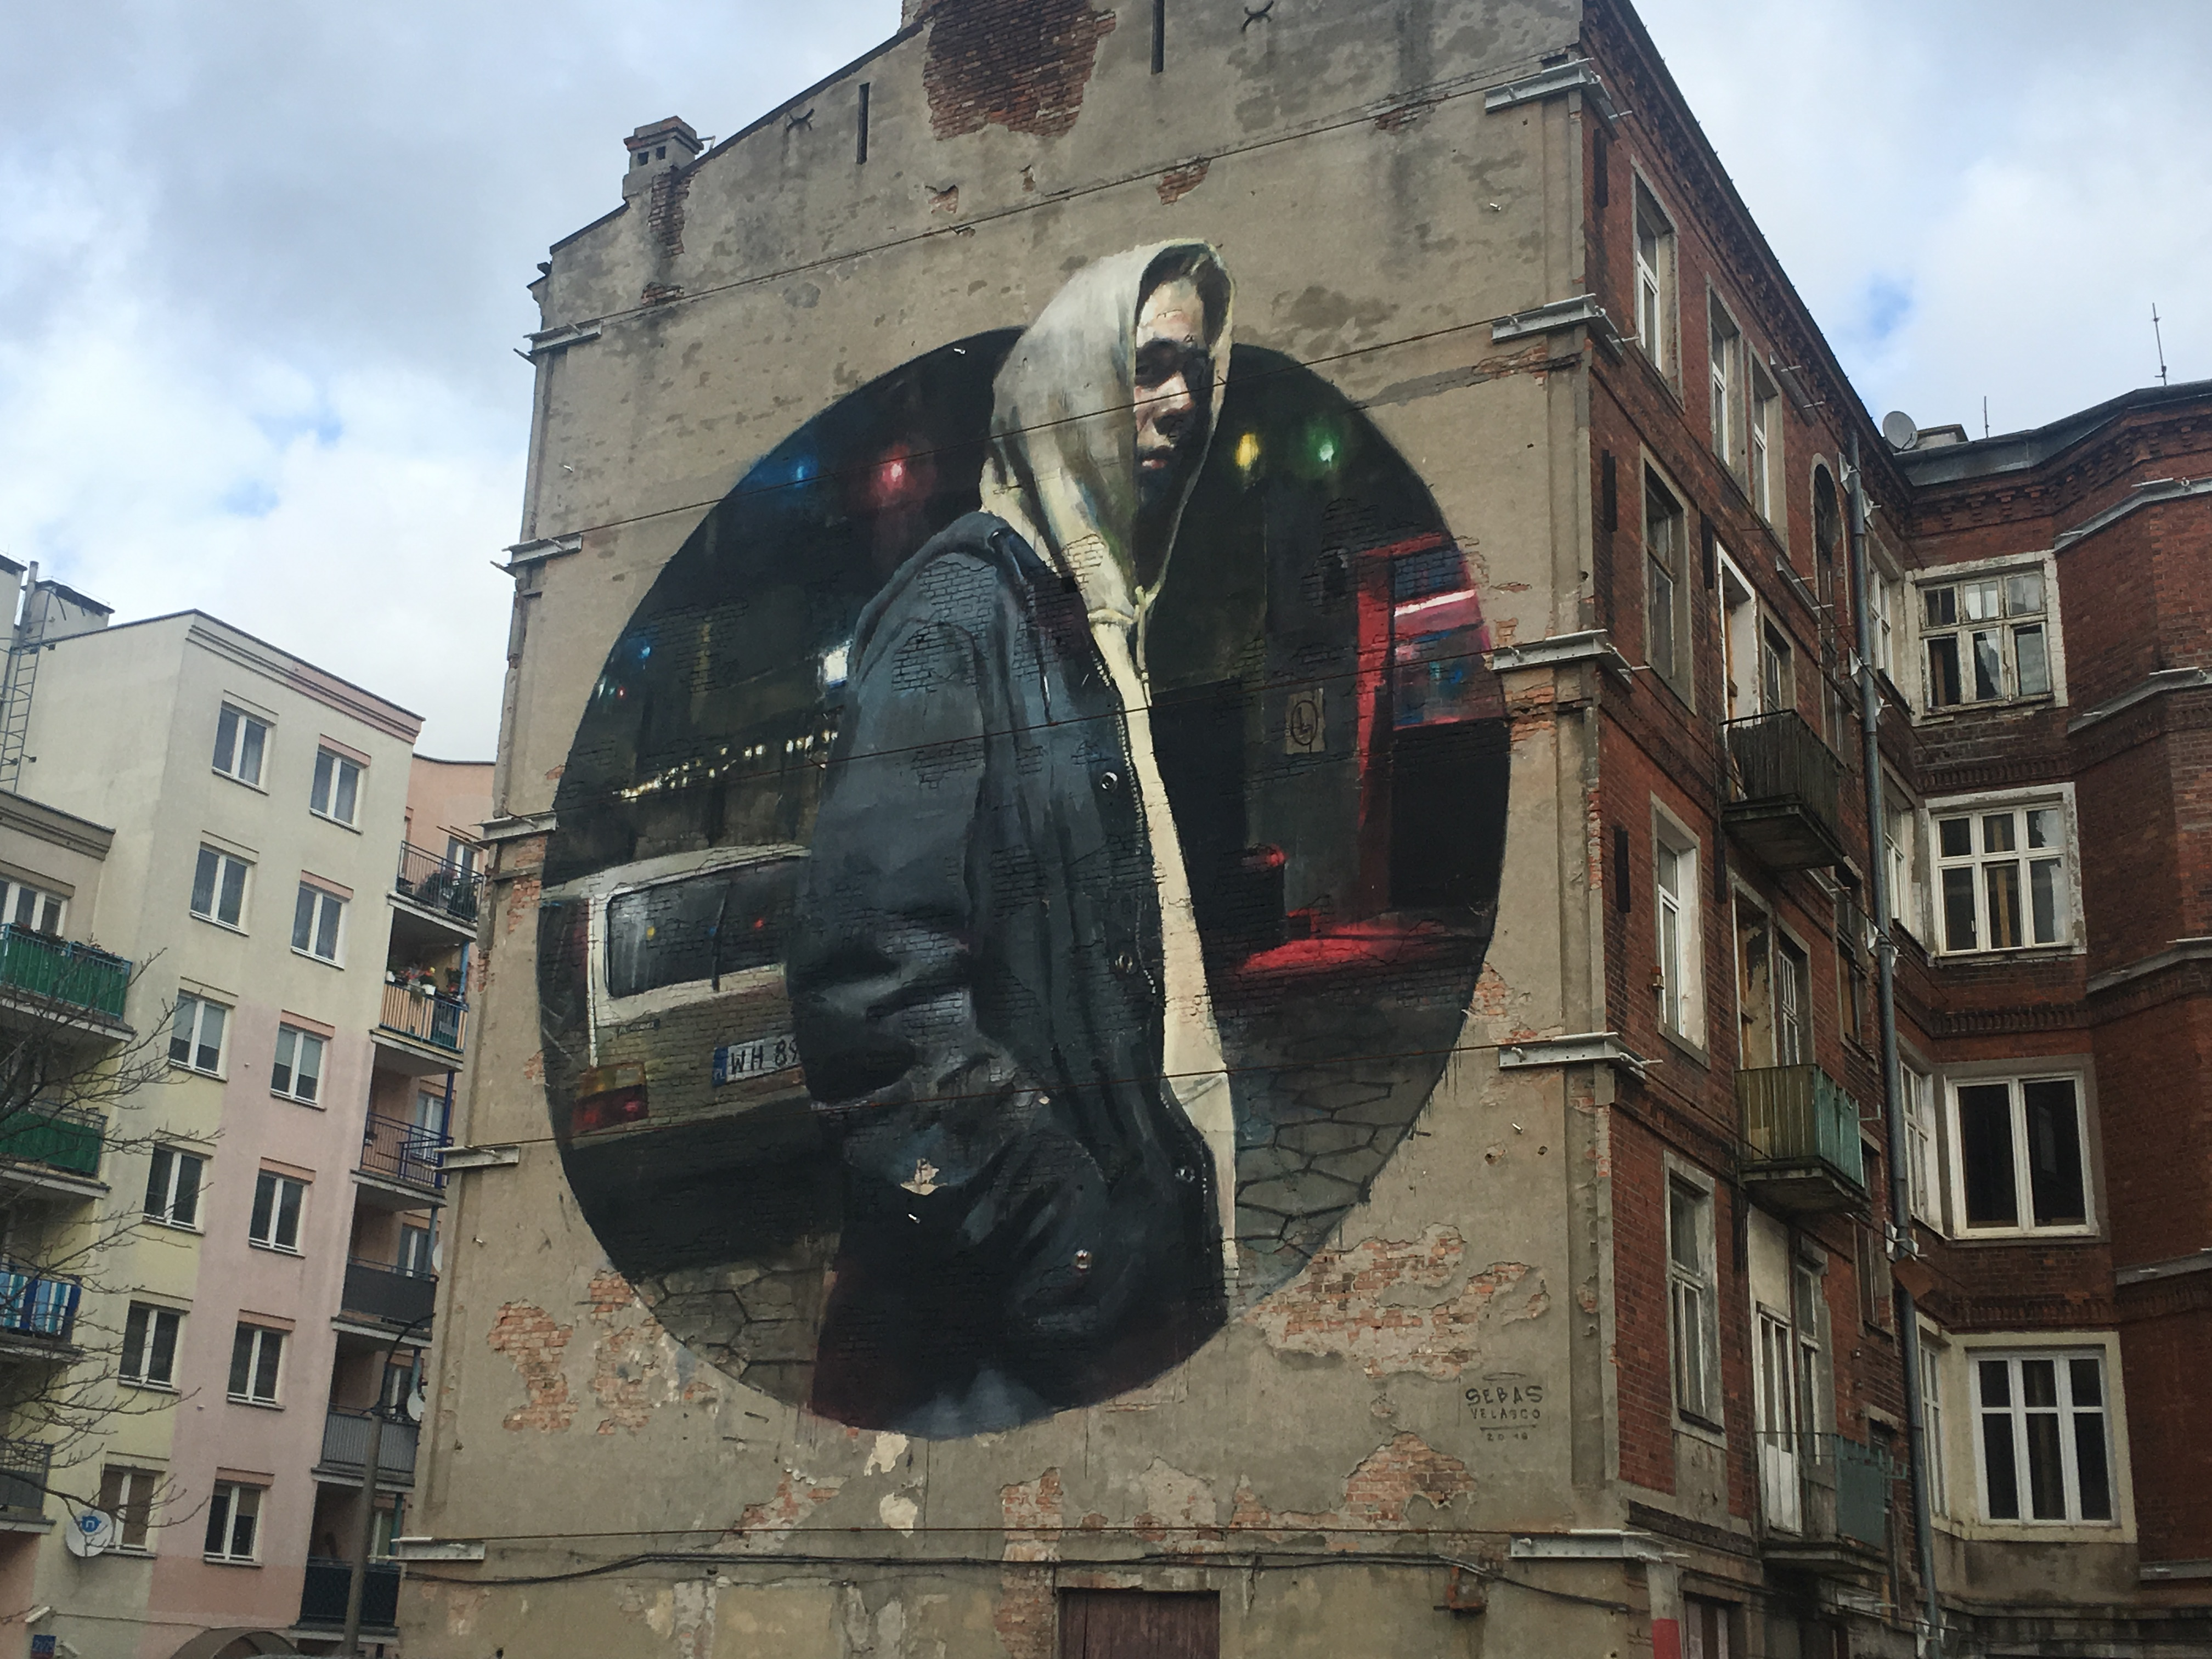 andysparkles-Monatsrückblick im Oktober-Praga-Warschau-Reiseblog